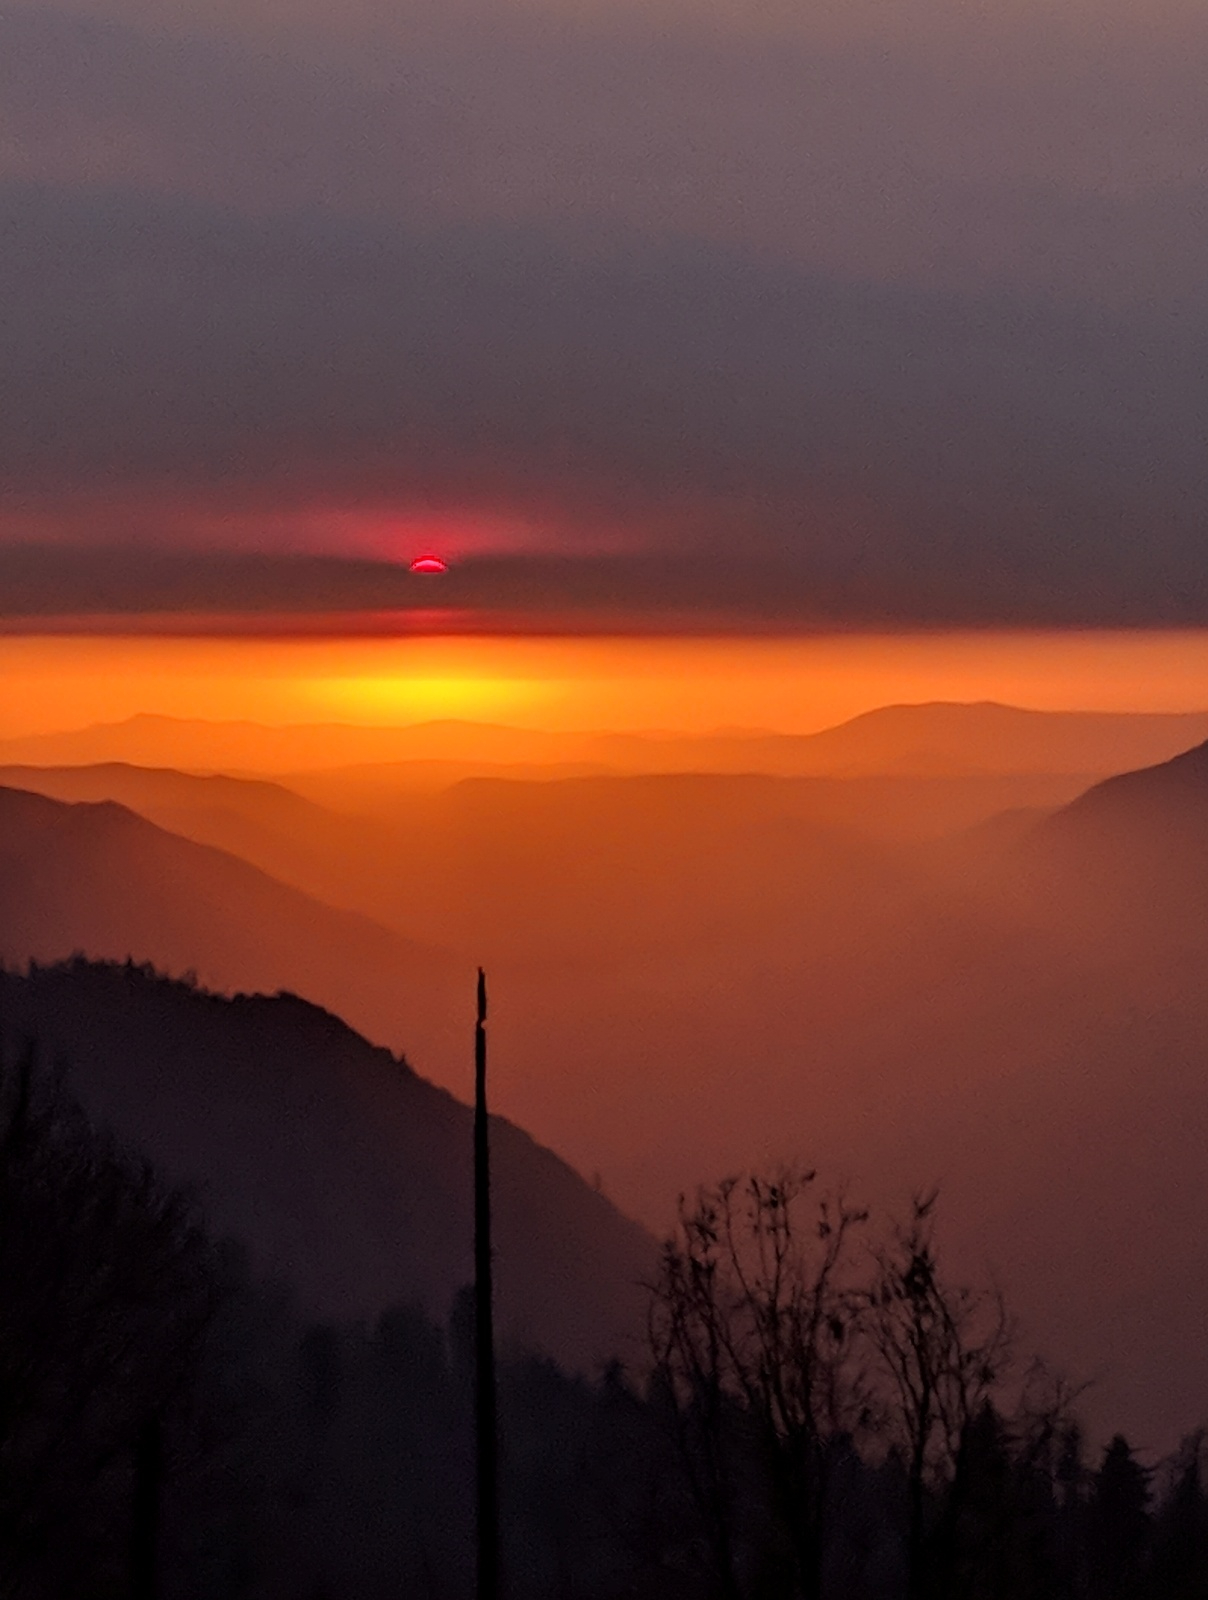 Sunset from the Wawona Road in Yosemite.